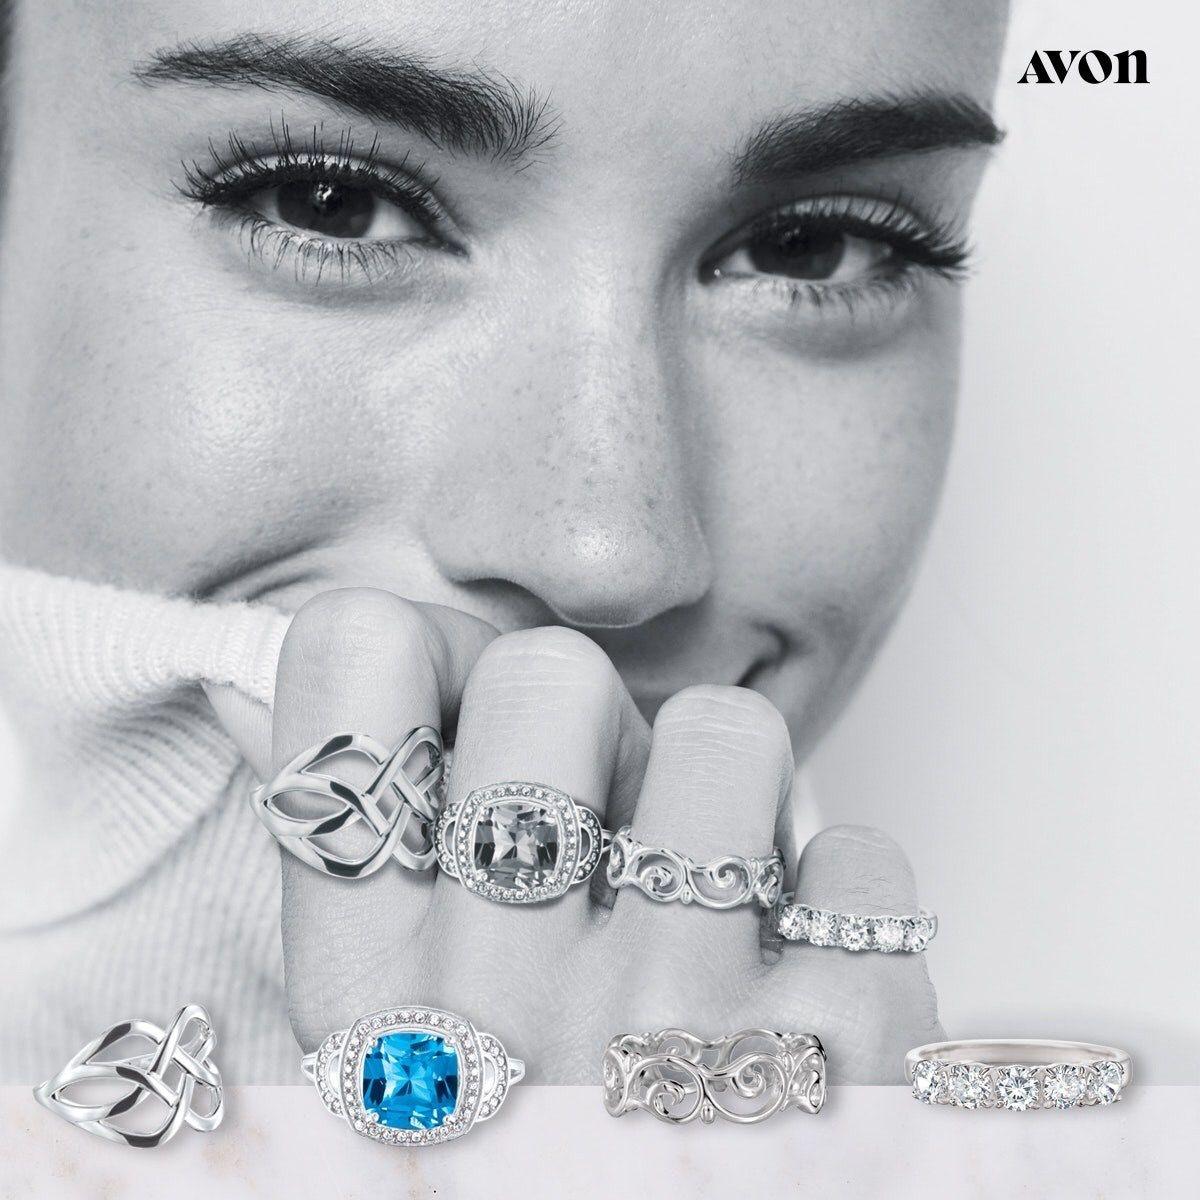 sara cz stone ring 6 avon